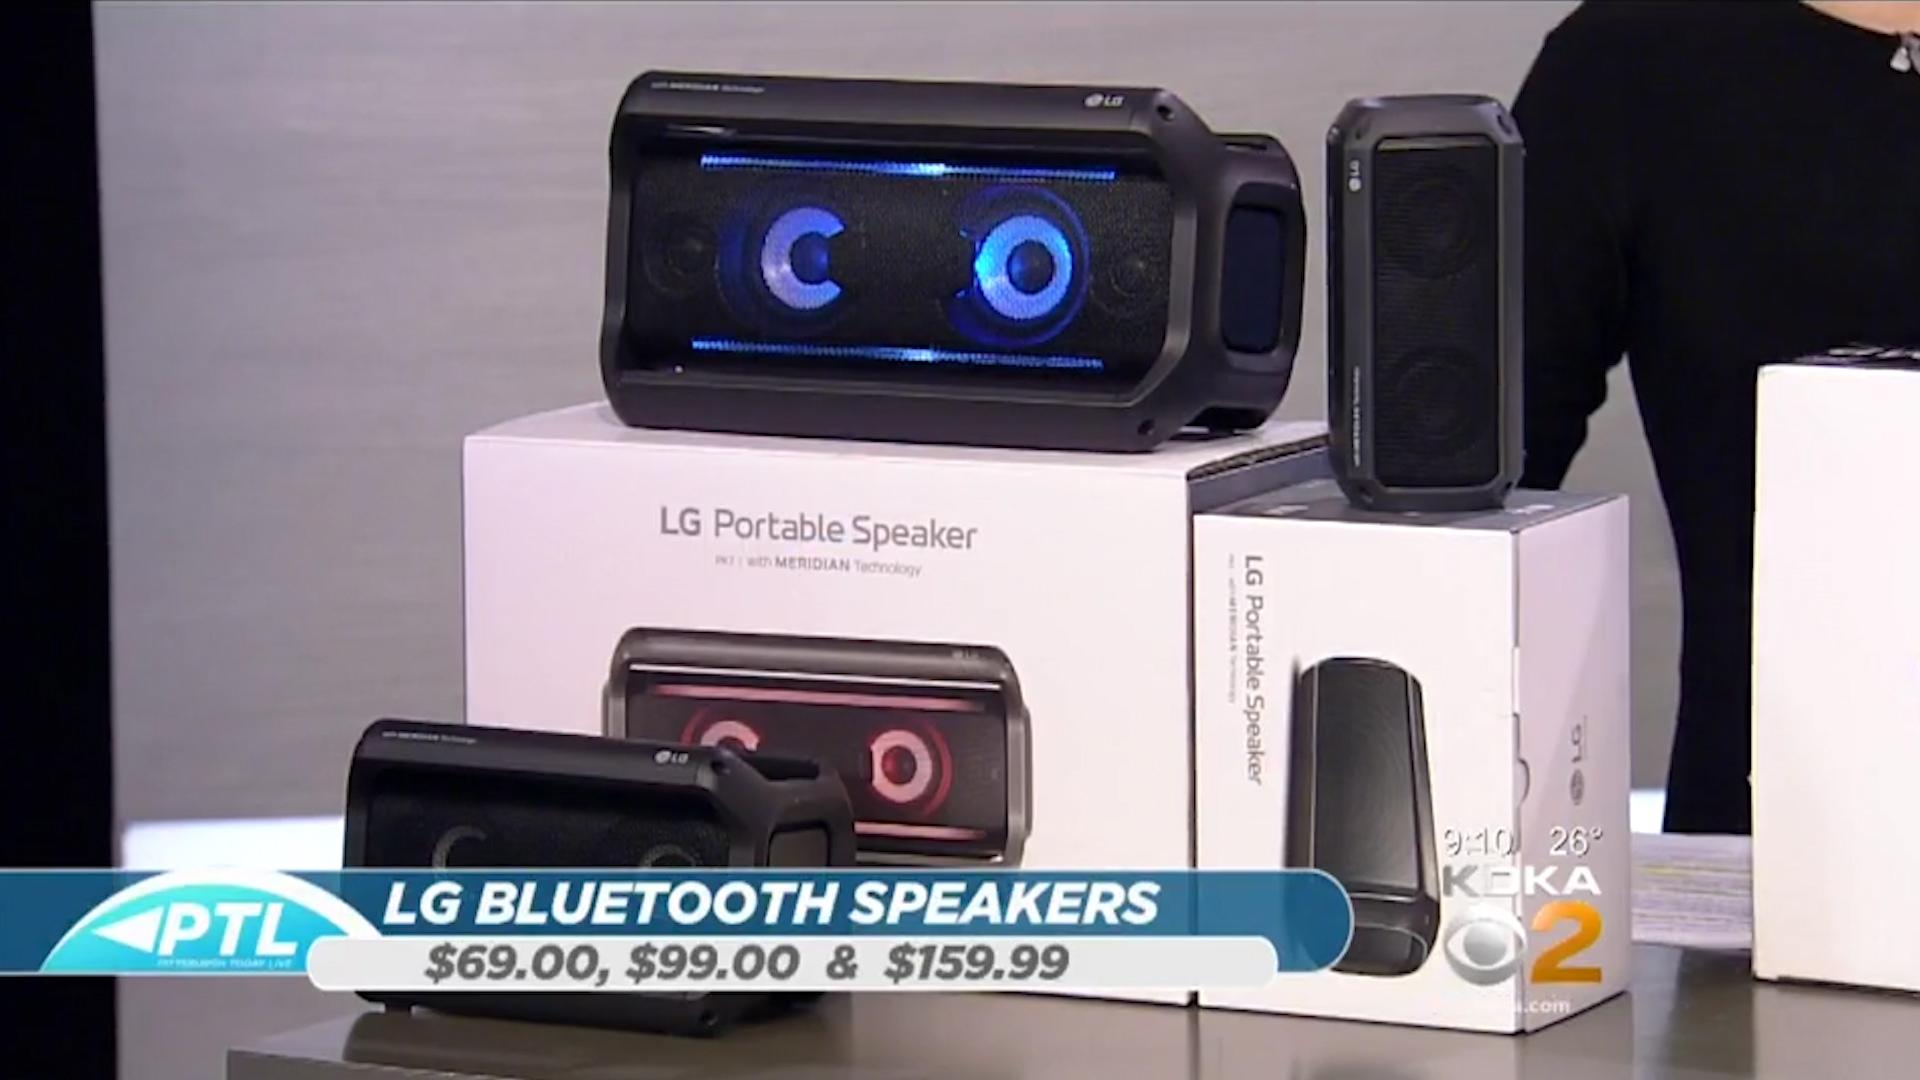 LG XBOOM PK 3, PK 5, & PK7 BLUETOOTH SPEAKERS - $69.00, $99.00,& $159.99Shop Now